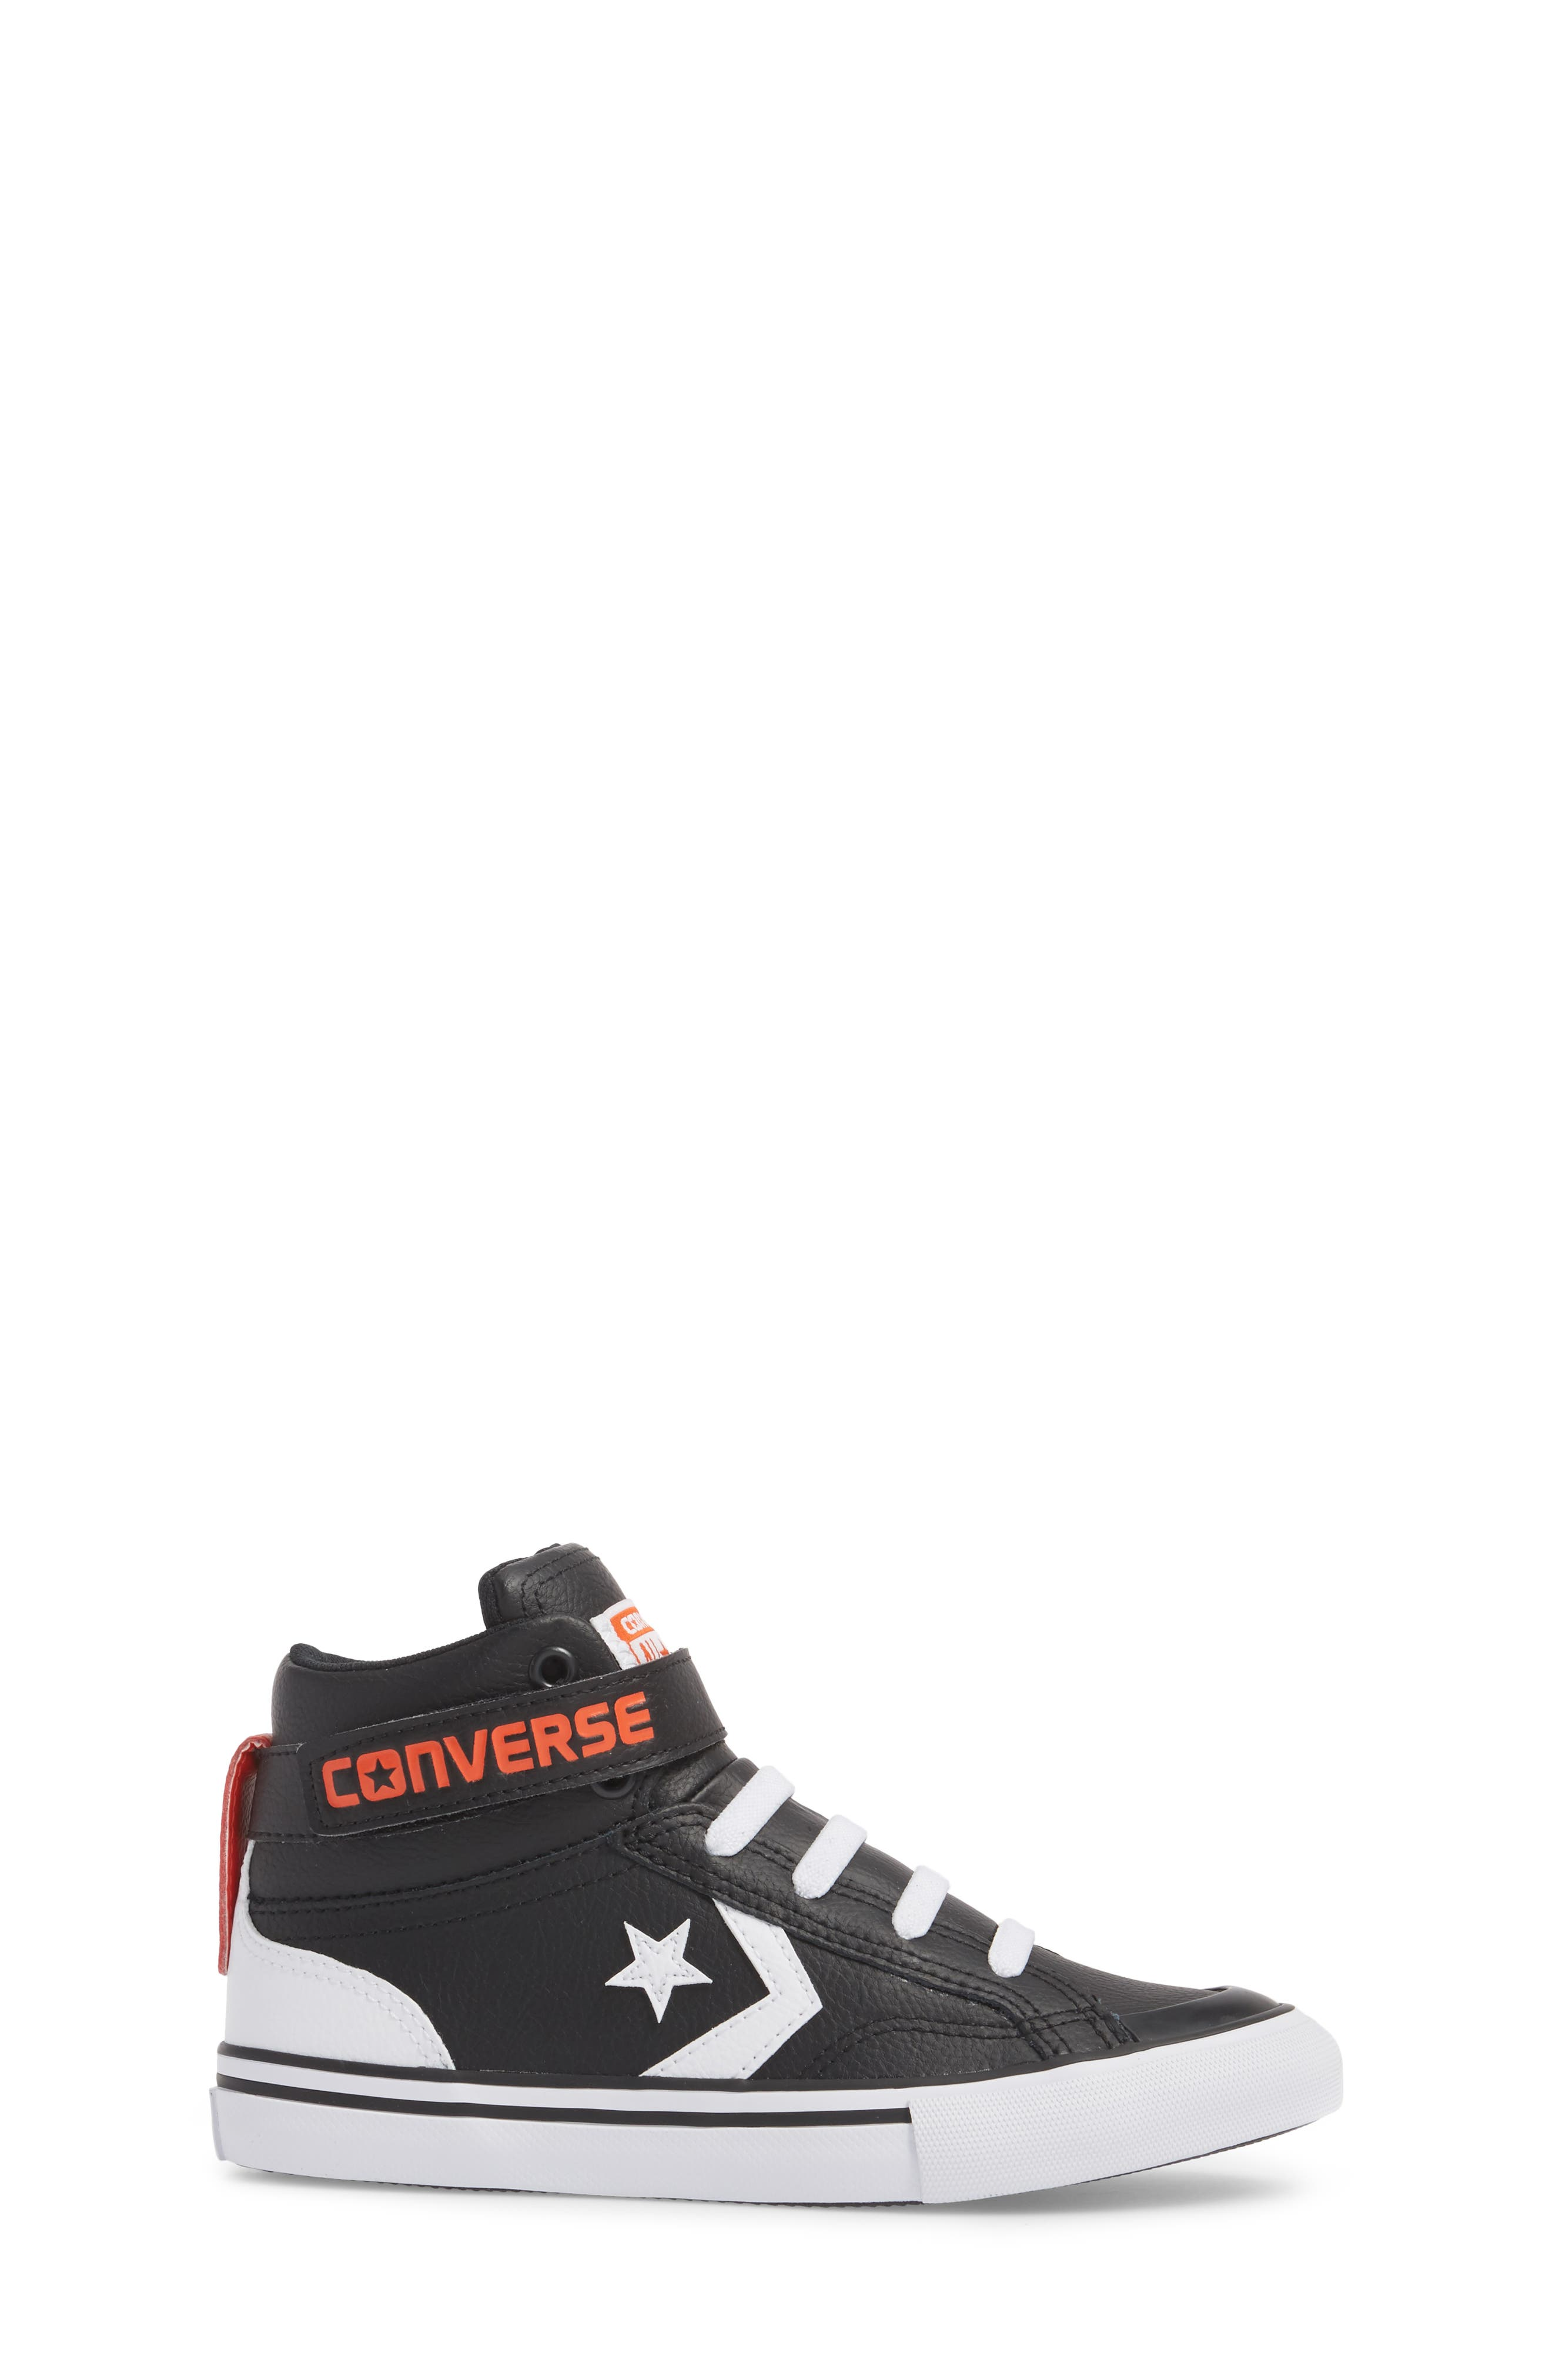 Pro Blaze High Top Sneaker,                             Alternate thumbnail 3, color,                             001